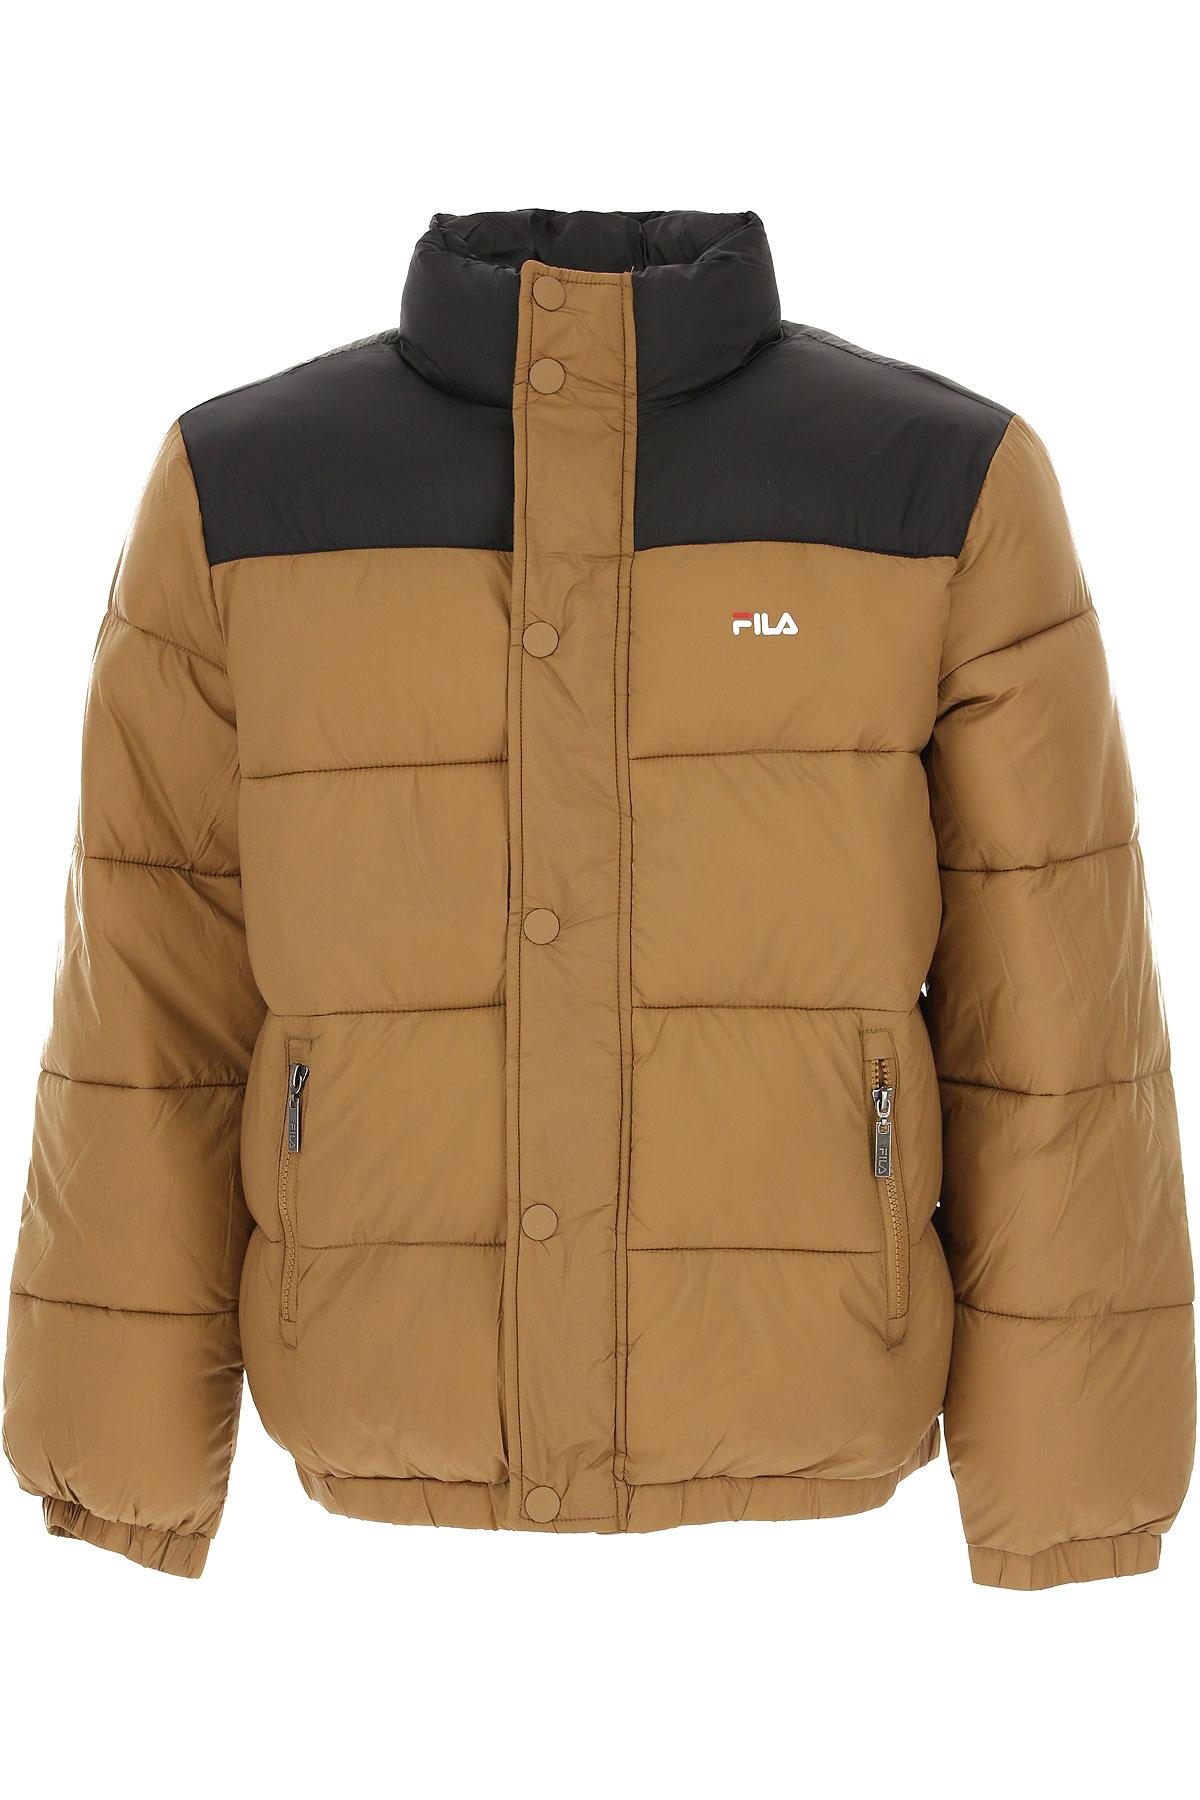 Image of Fila Down Jacket for Men, Puffer Ski Jacket, Camel, polyester, 2017, L M S XL